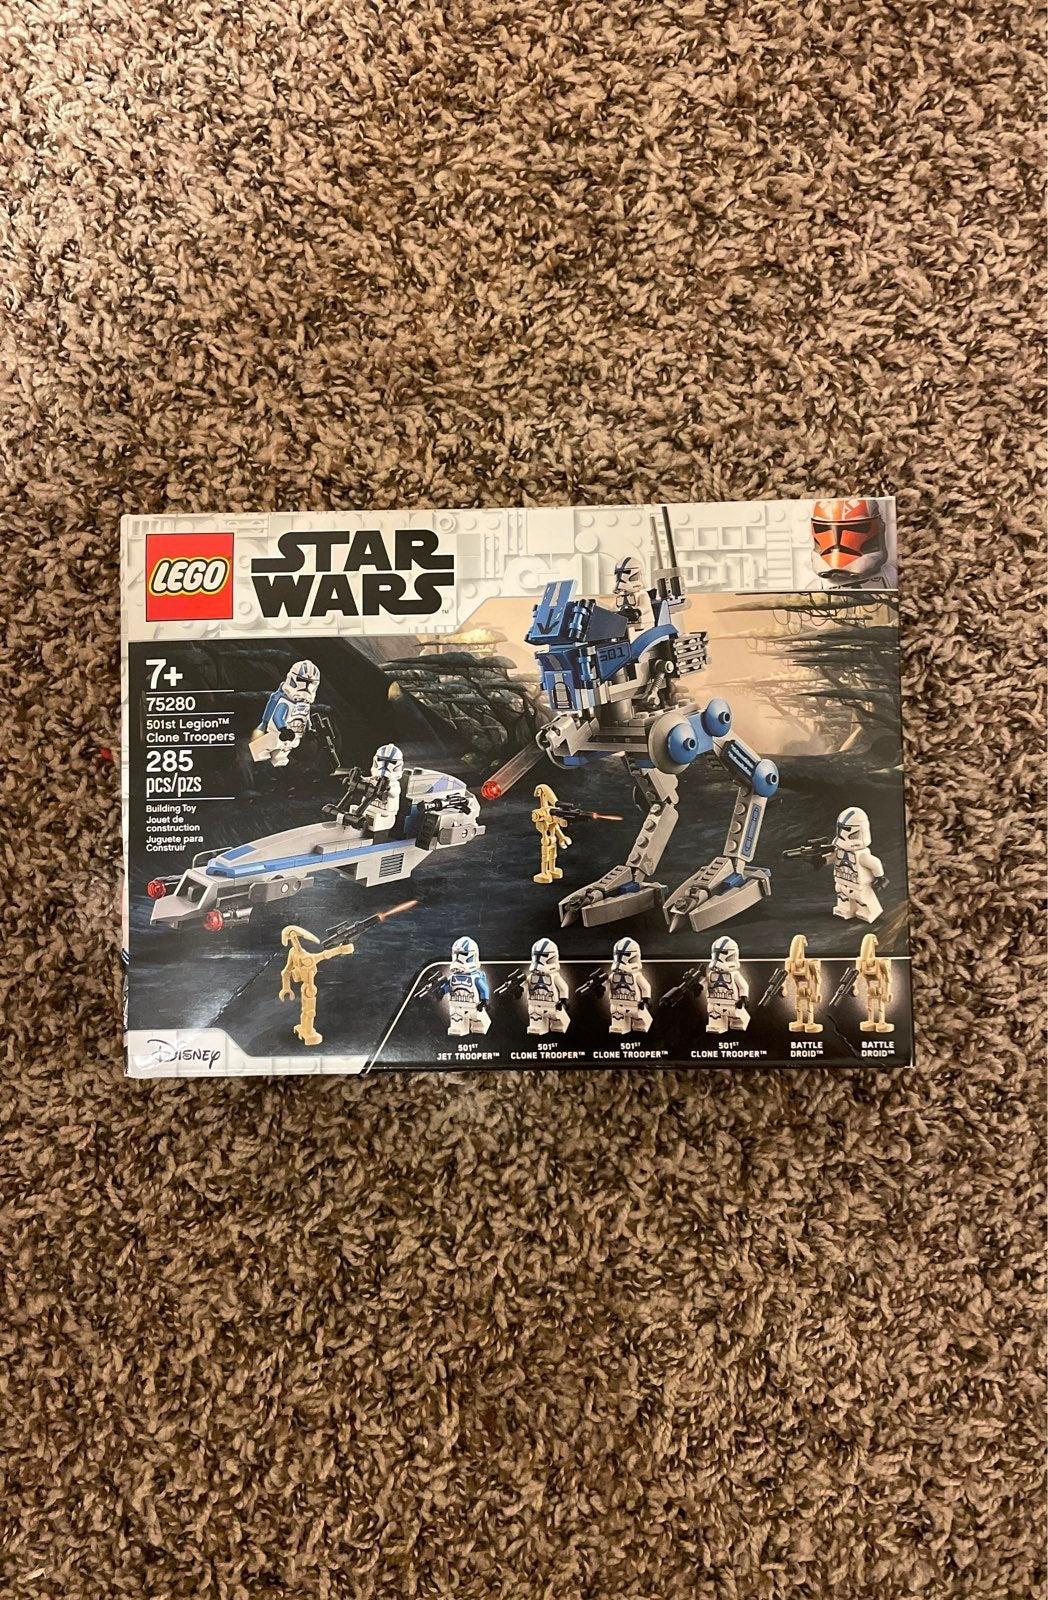 Lego Star Wars 501st Legion and Armored